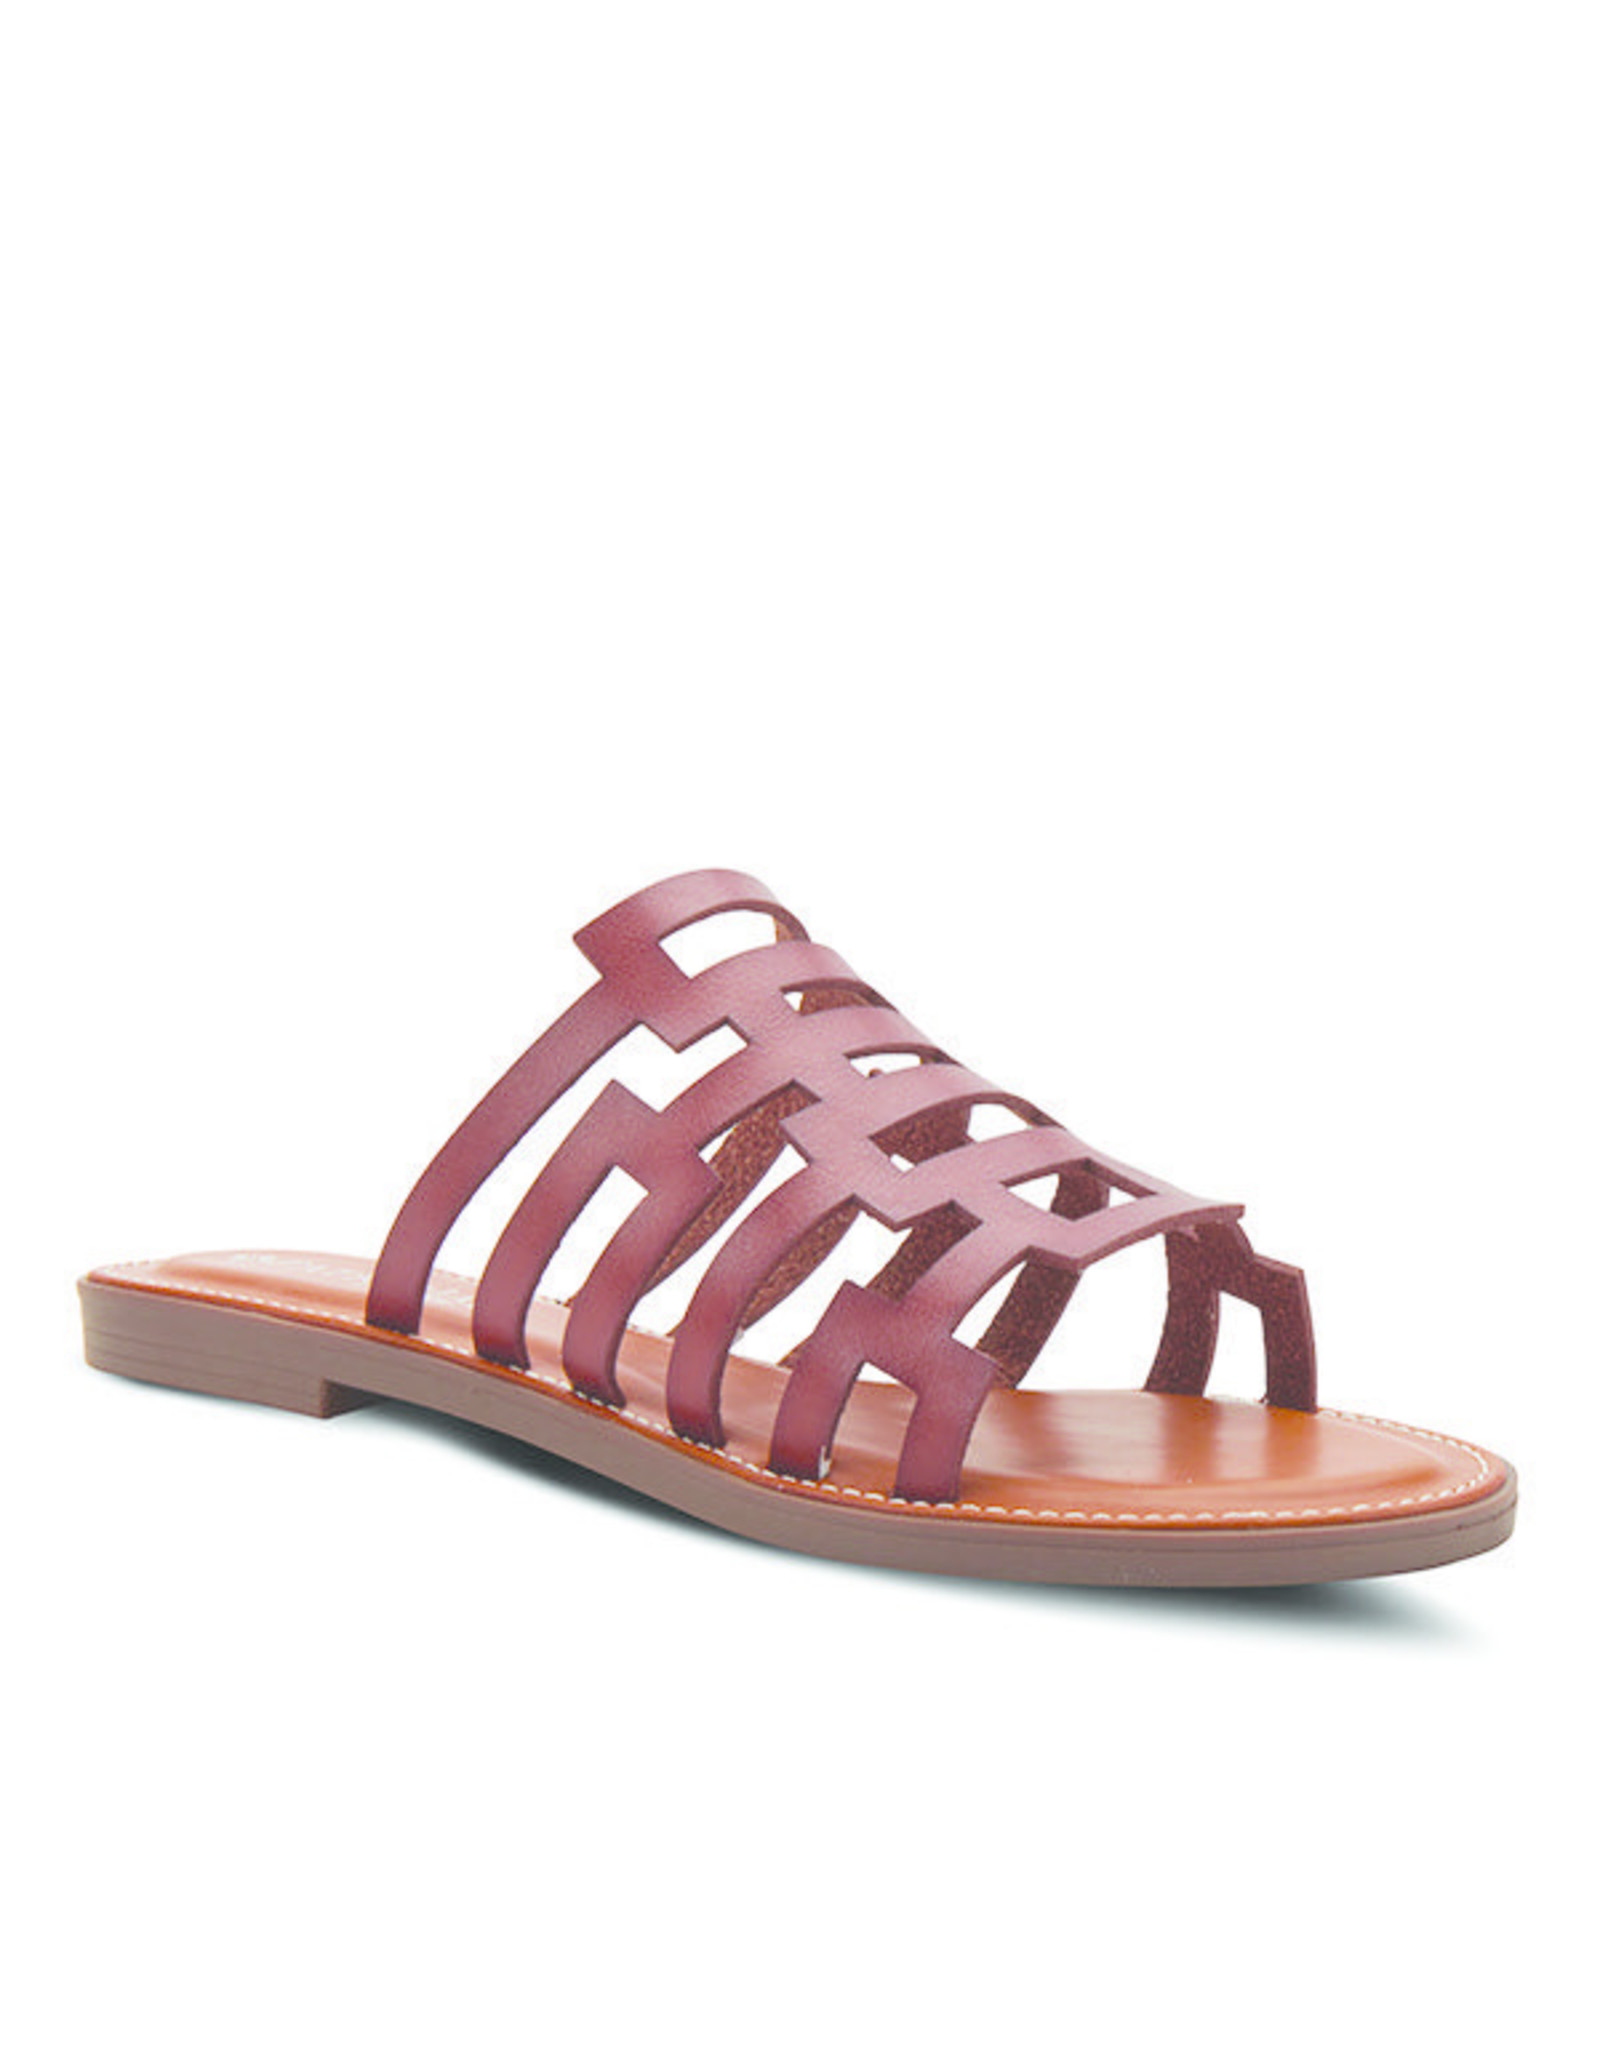 Amaze Slide Sandal